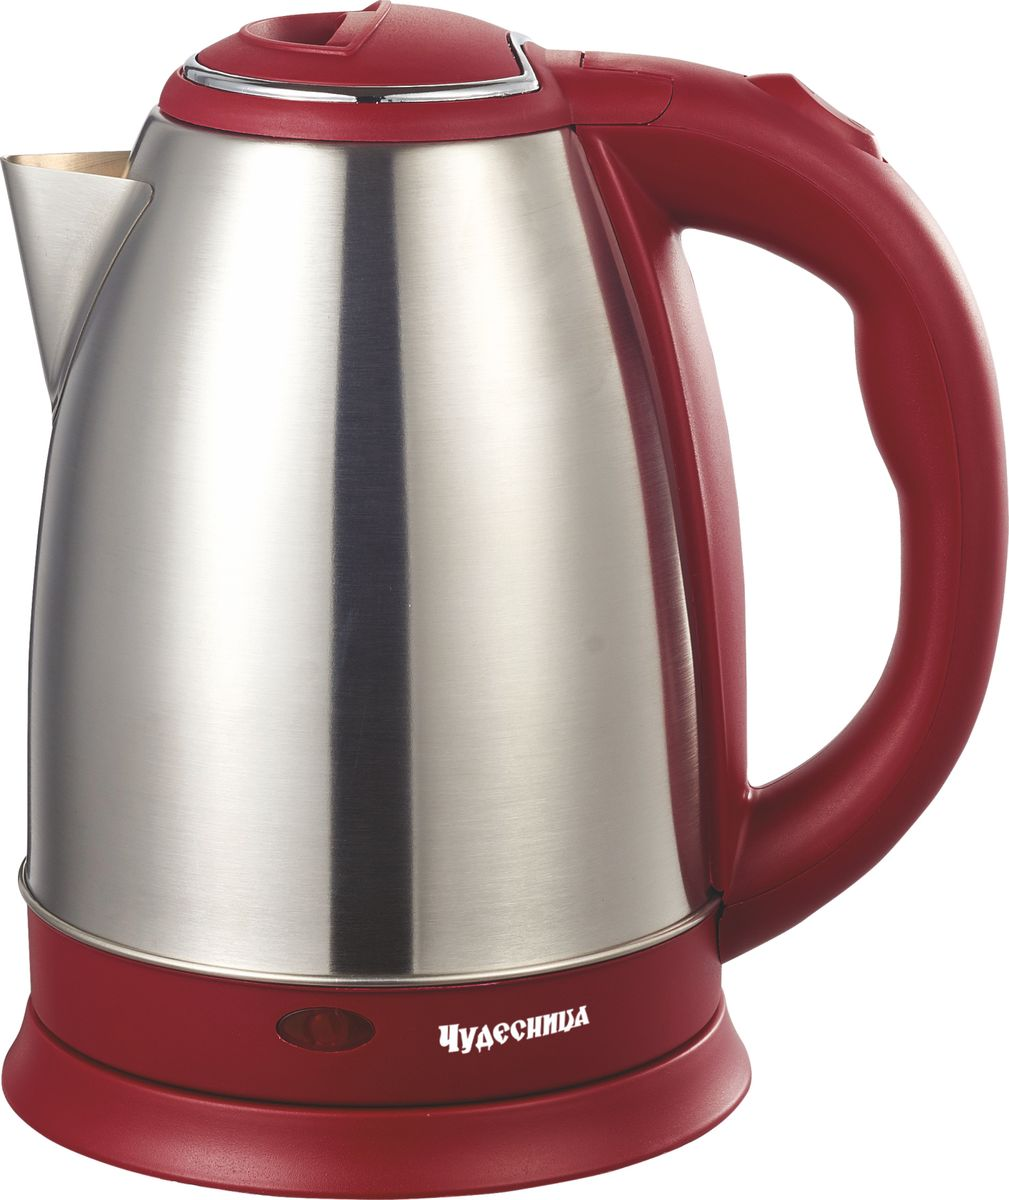 лучшая цена Электрический чайник Чудесница ЭЧ-2019, Red